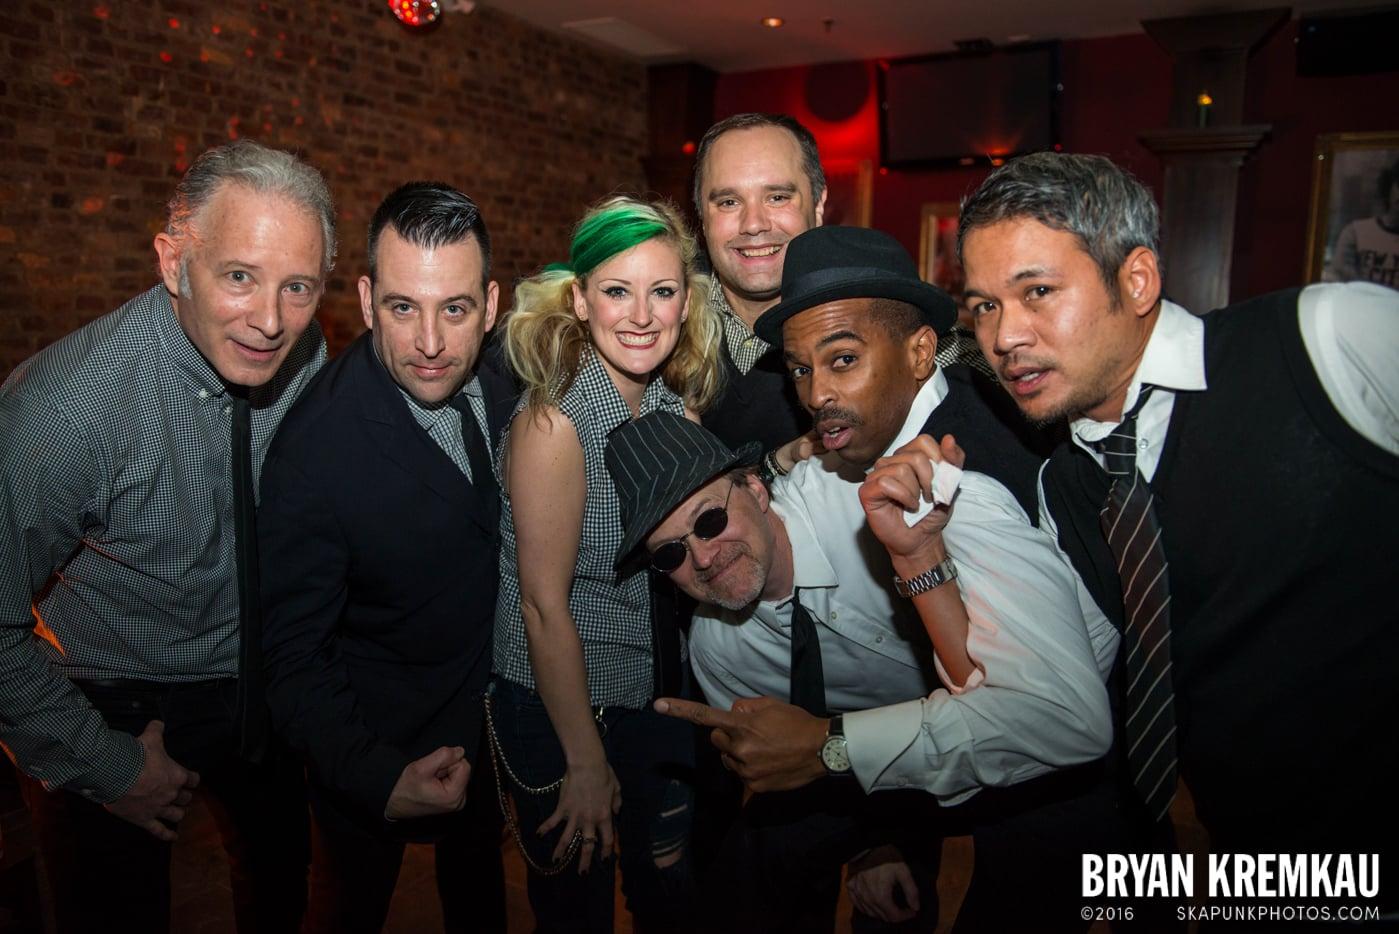 Rude Boy George @ Characters, NYC - 11.16.13 (39)